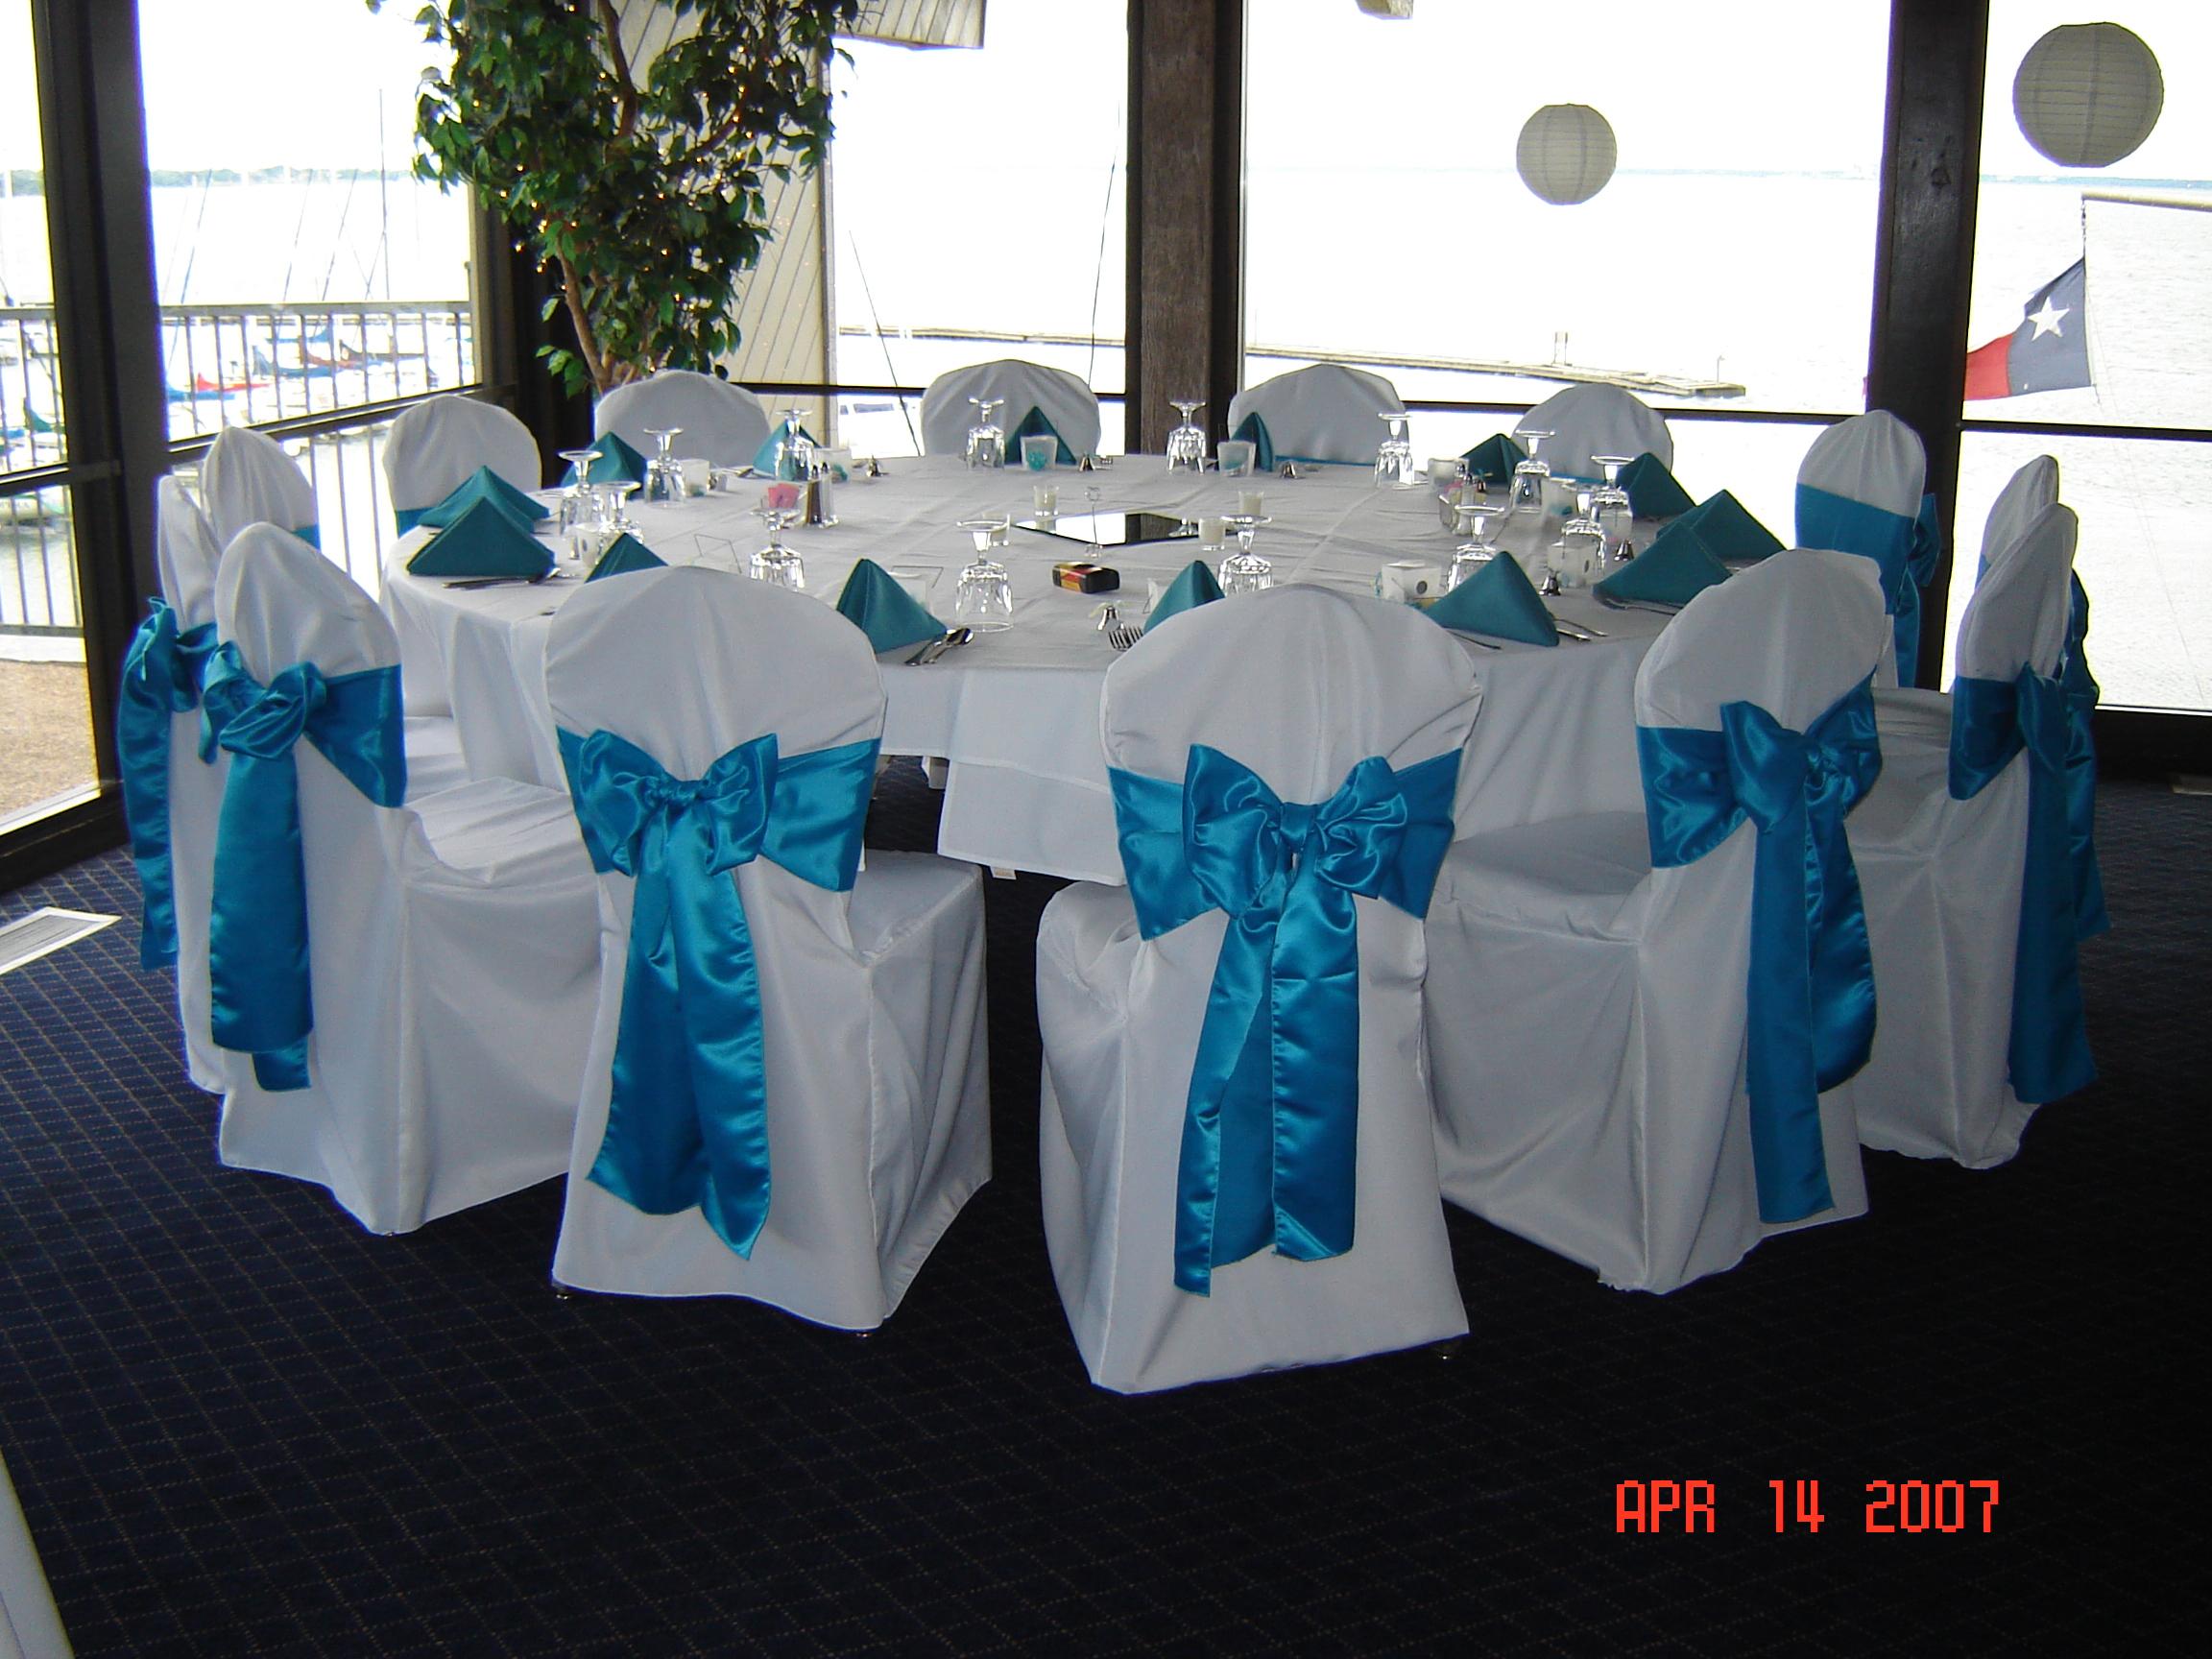 Simply Elegant Weddings Lamour Satin Linen Rentals Fort